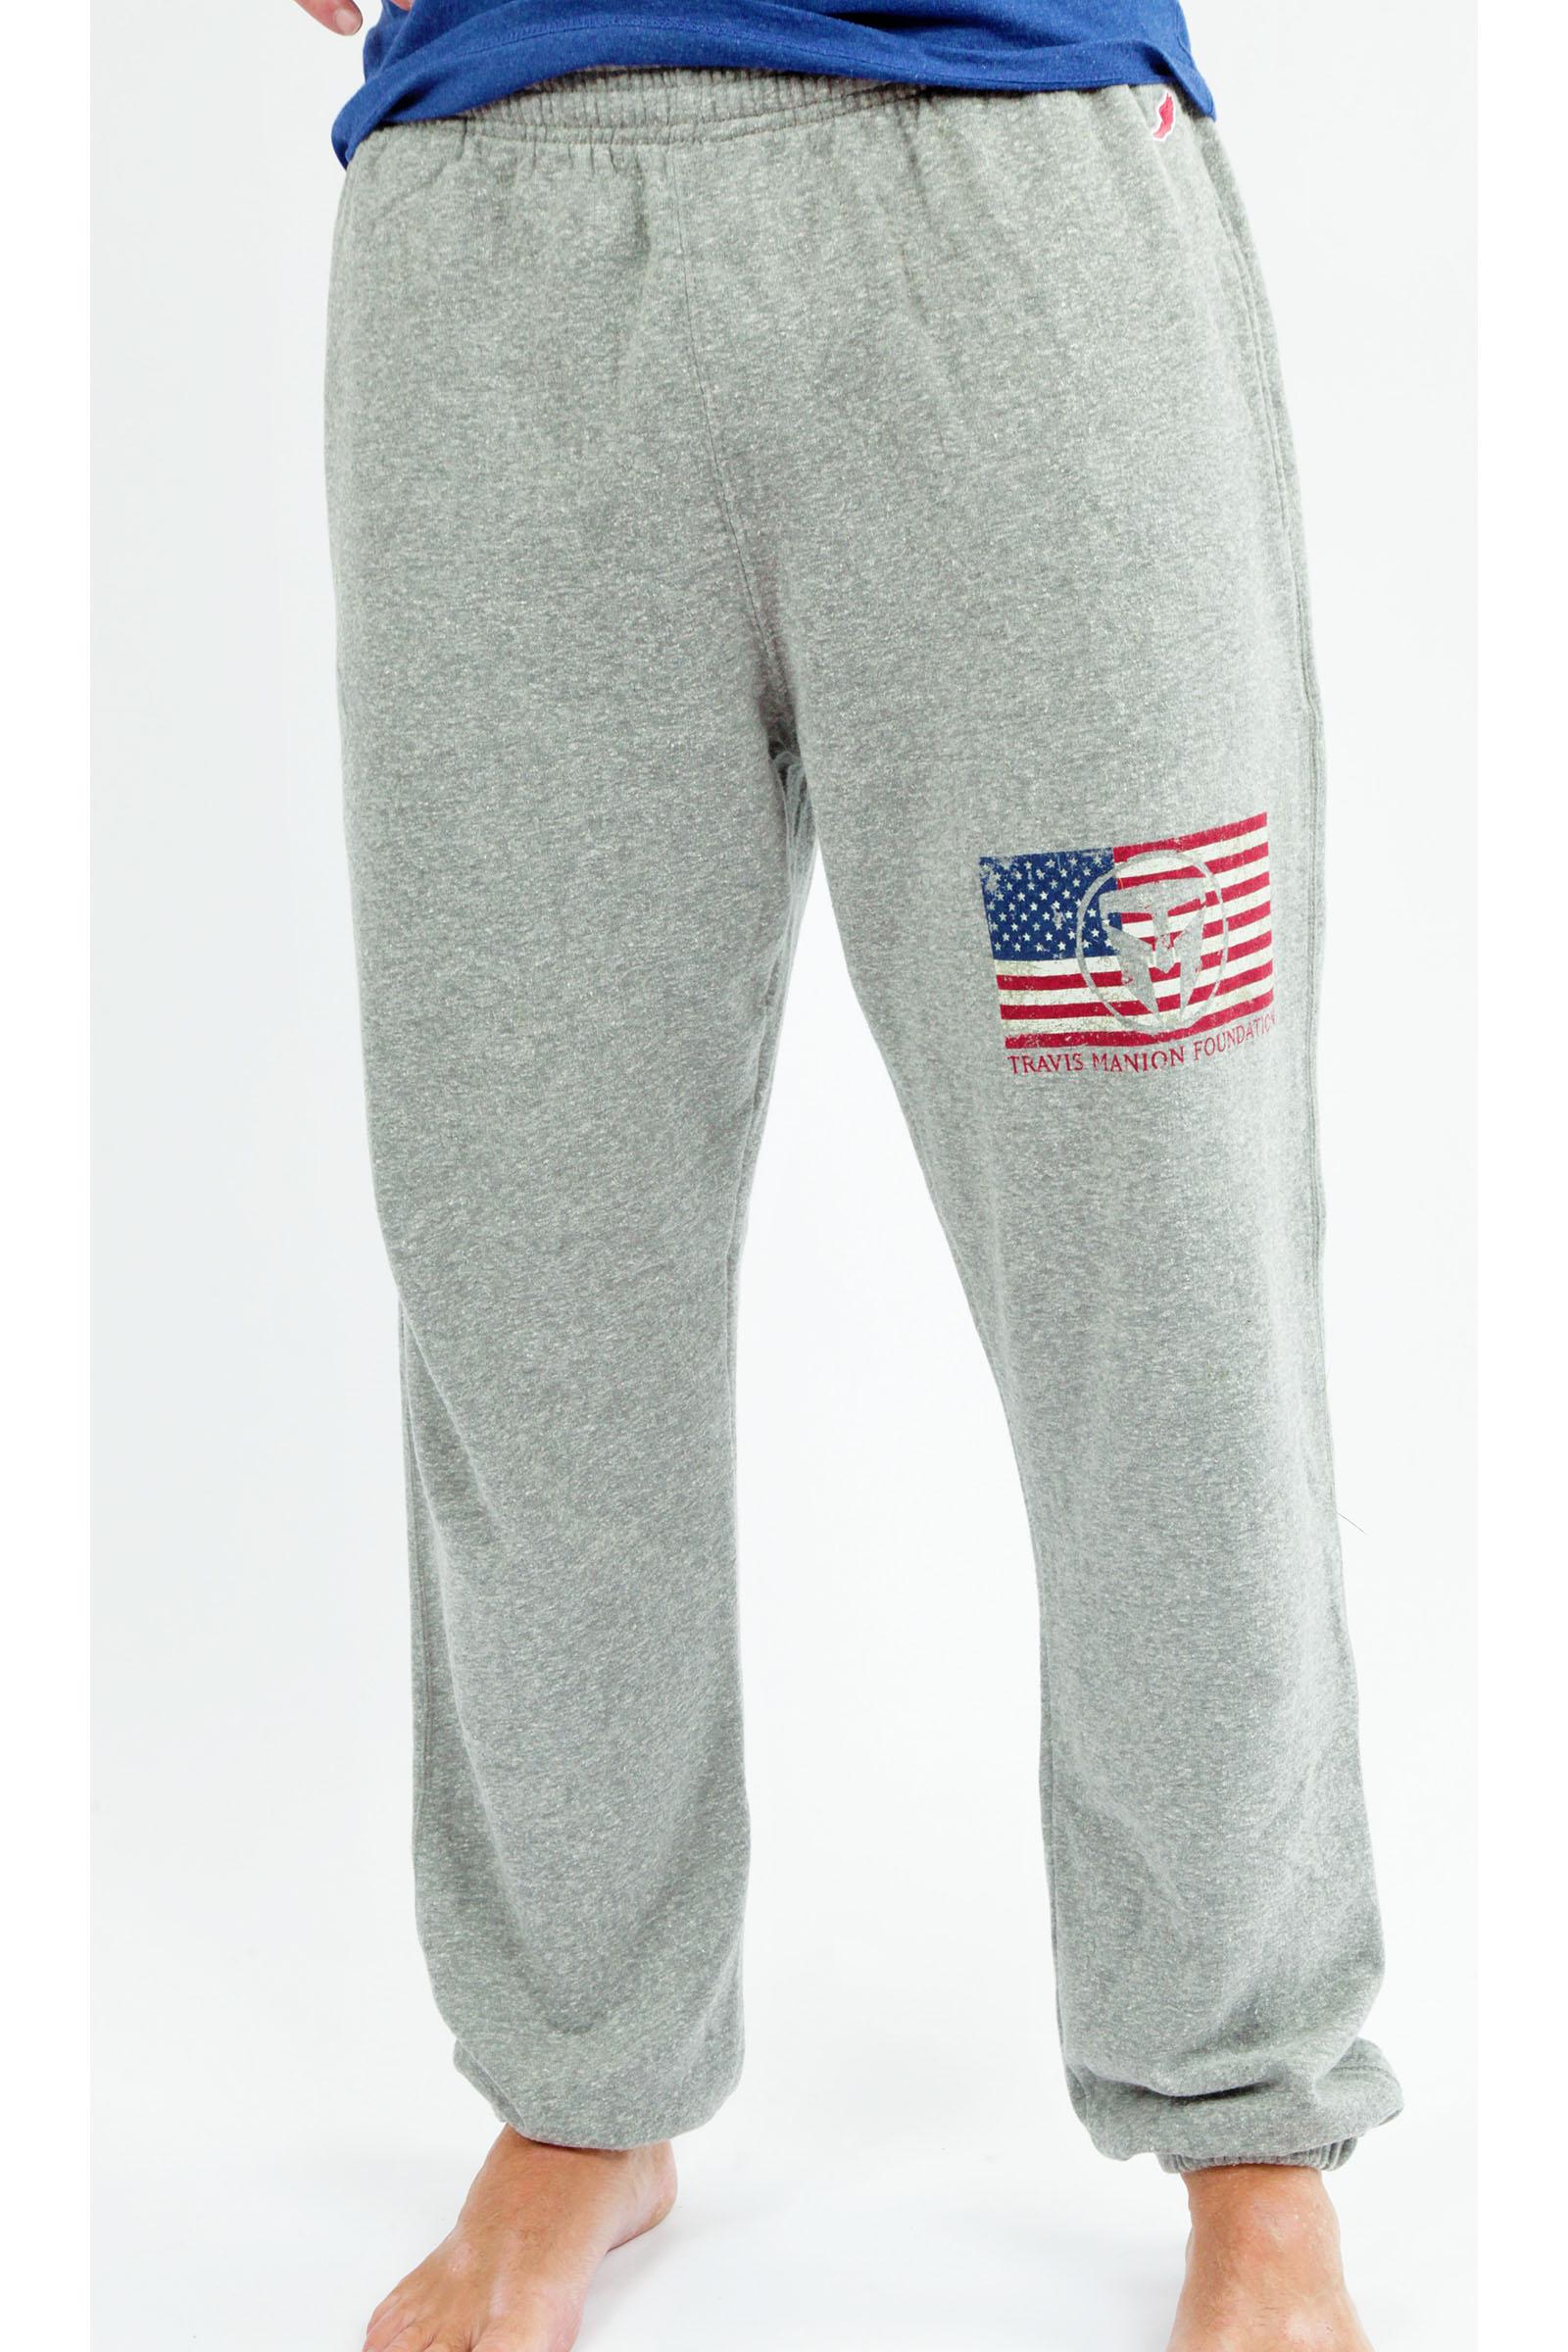 TMF Unisex Tri-Blend TMF Sweatpants